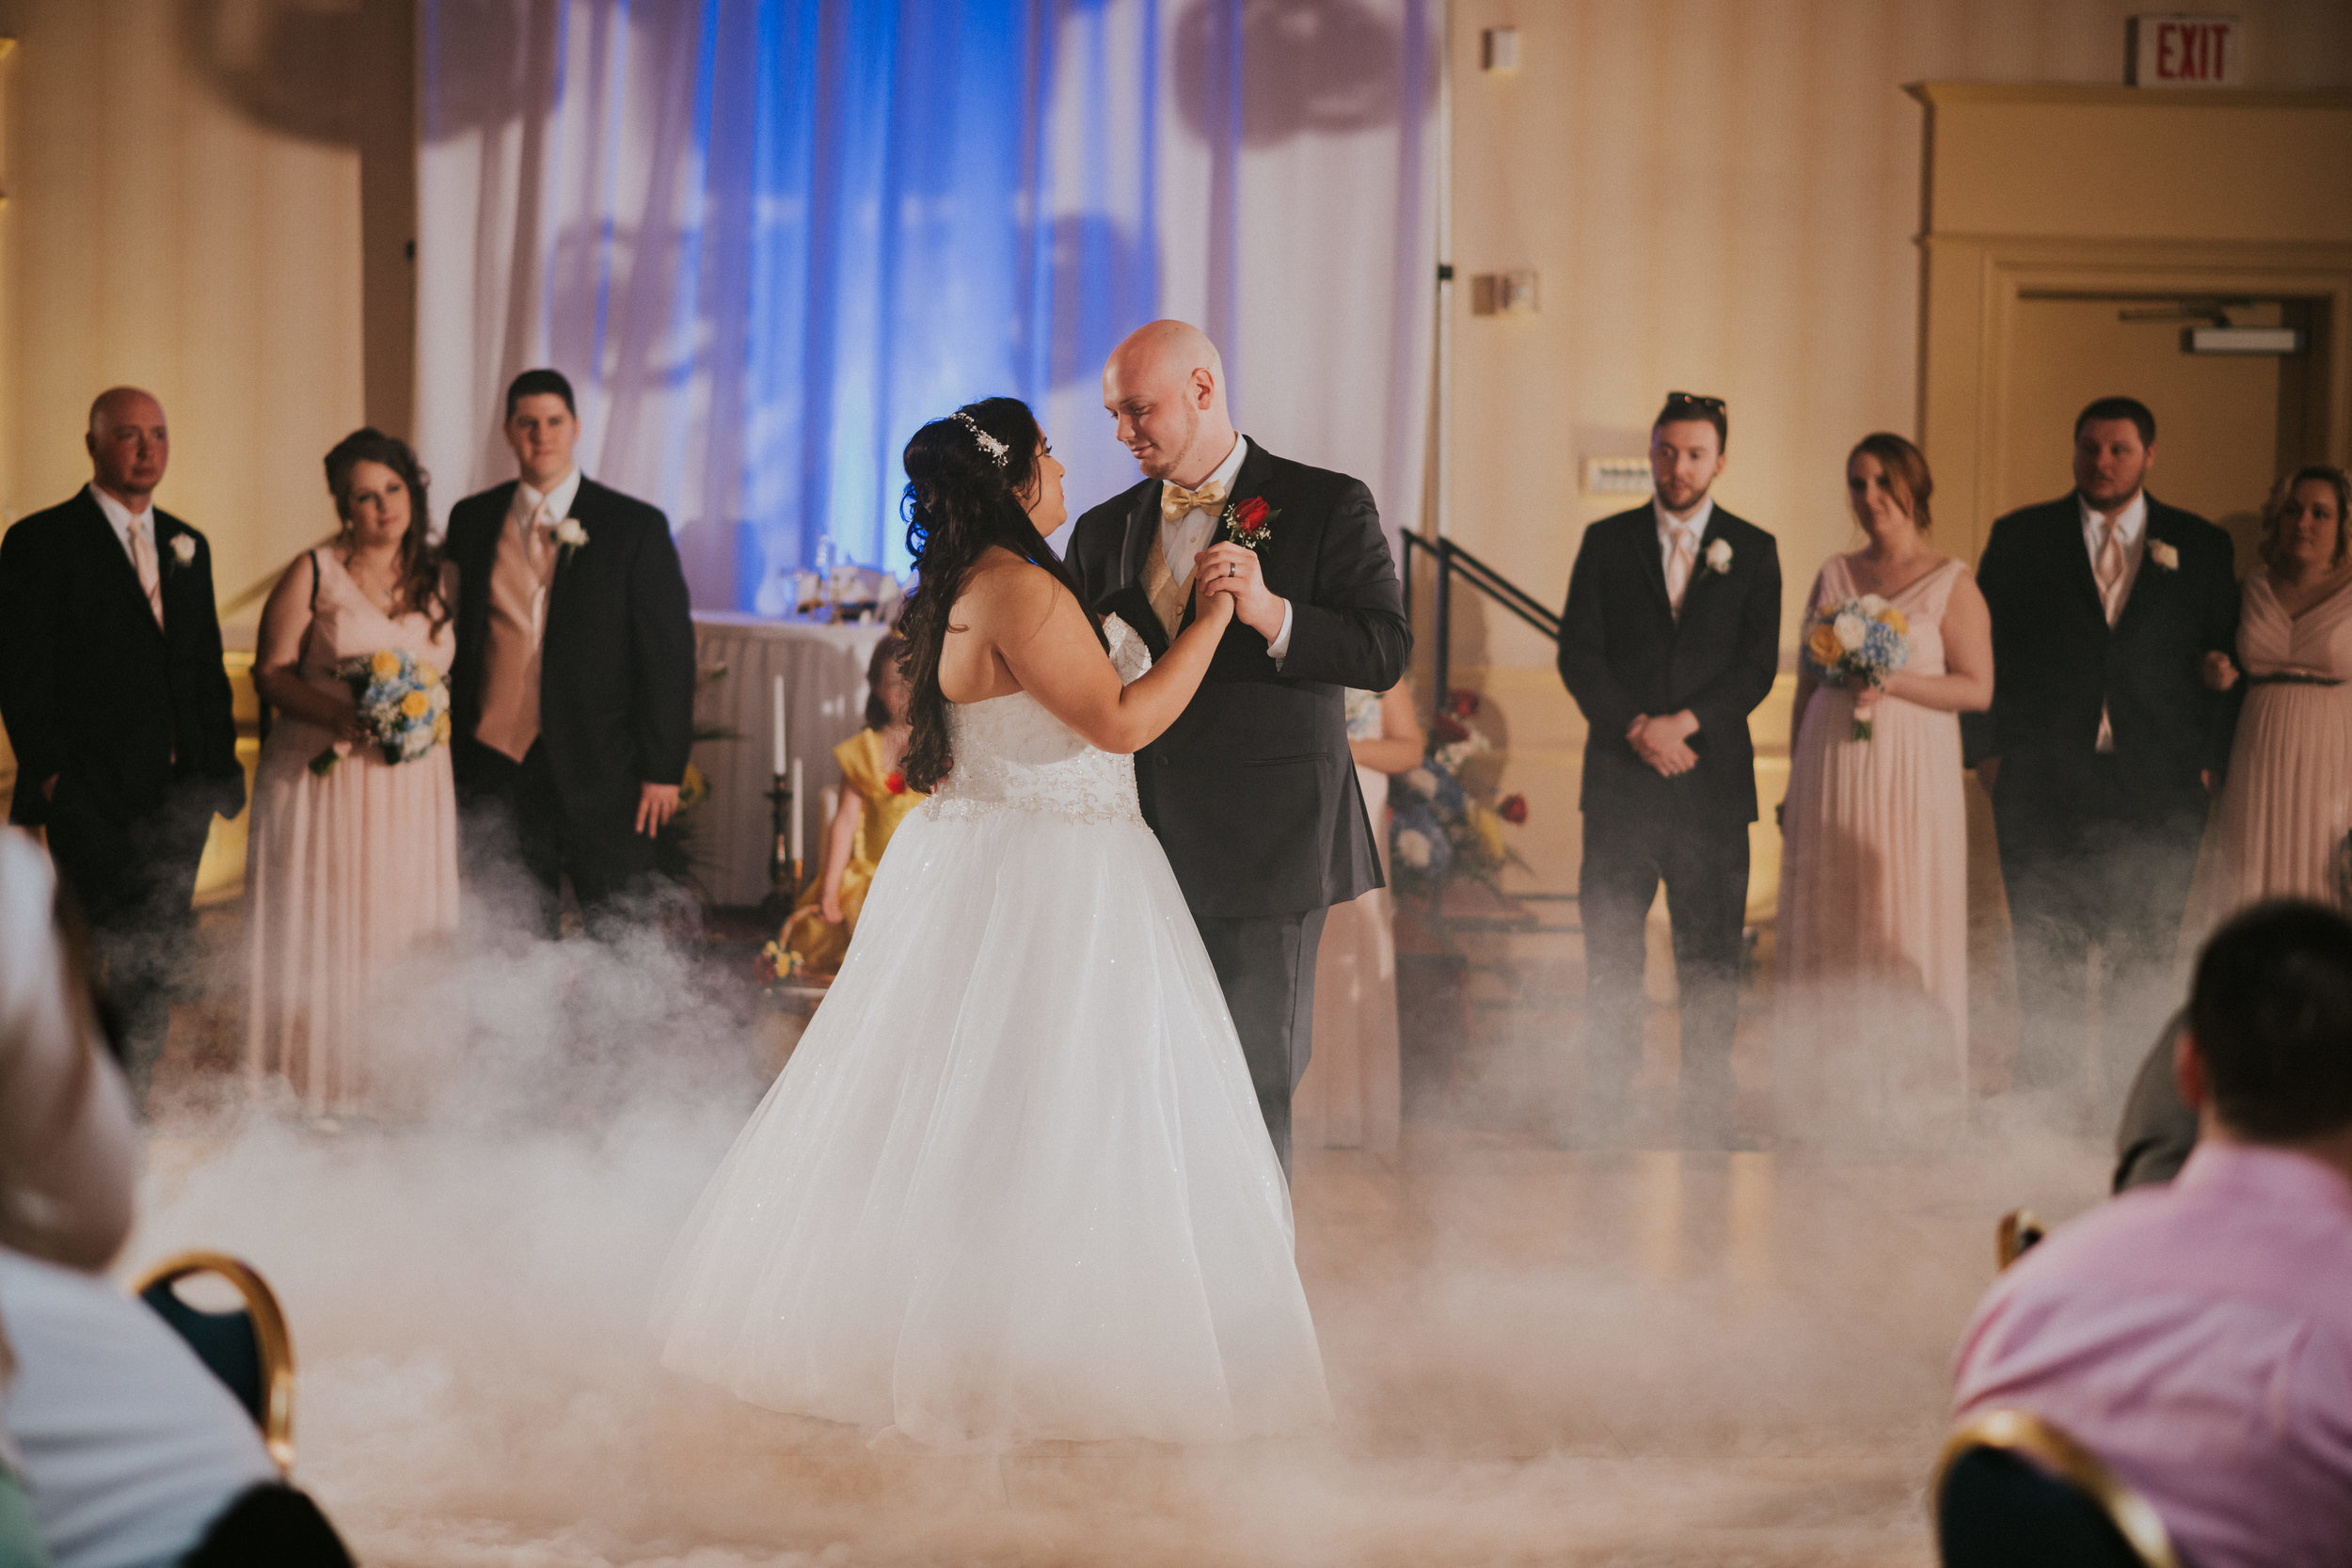 Barclay-Farmstead-Wedding-Rosa-and-Mike-541.jpg